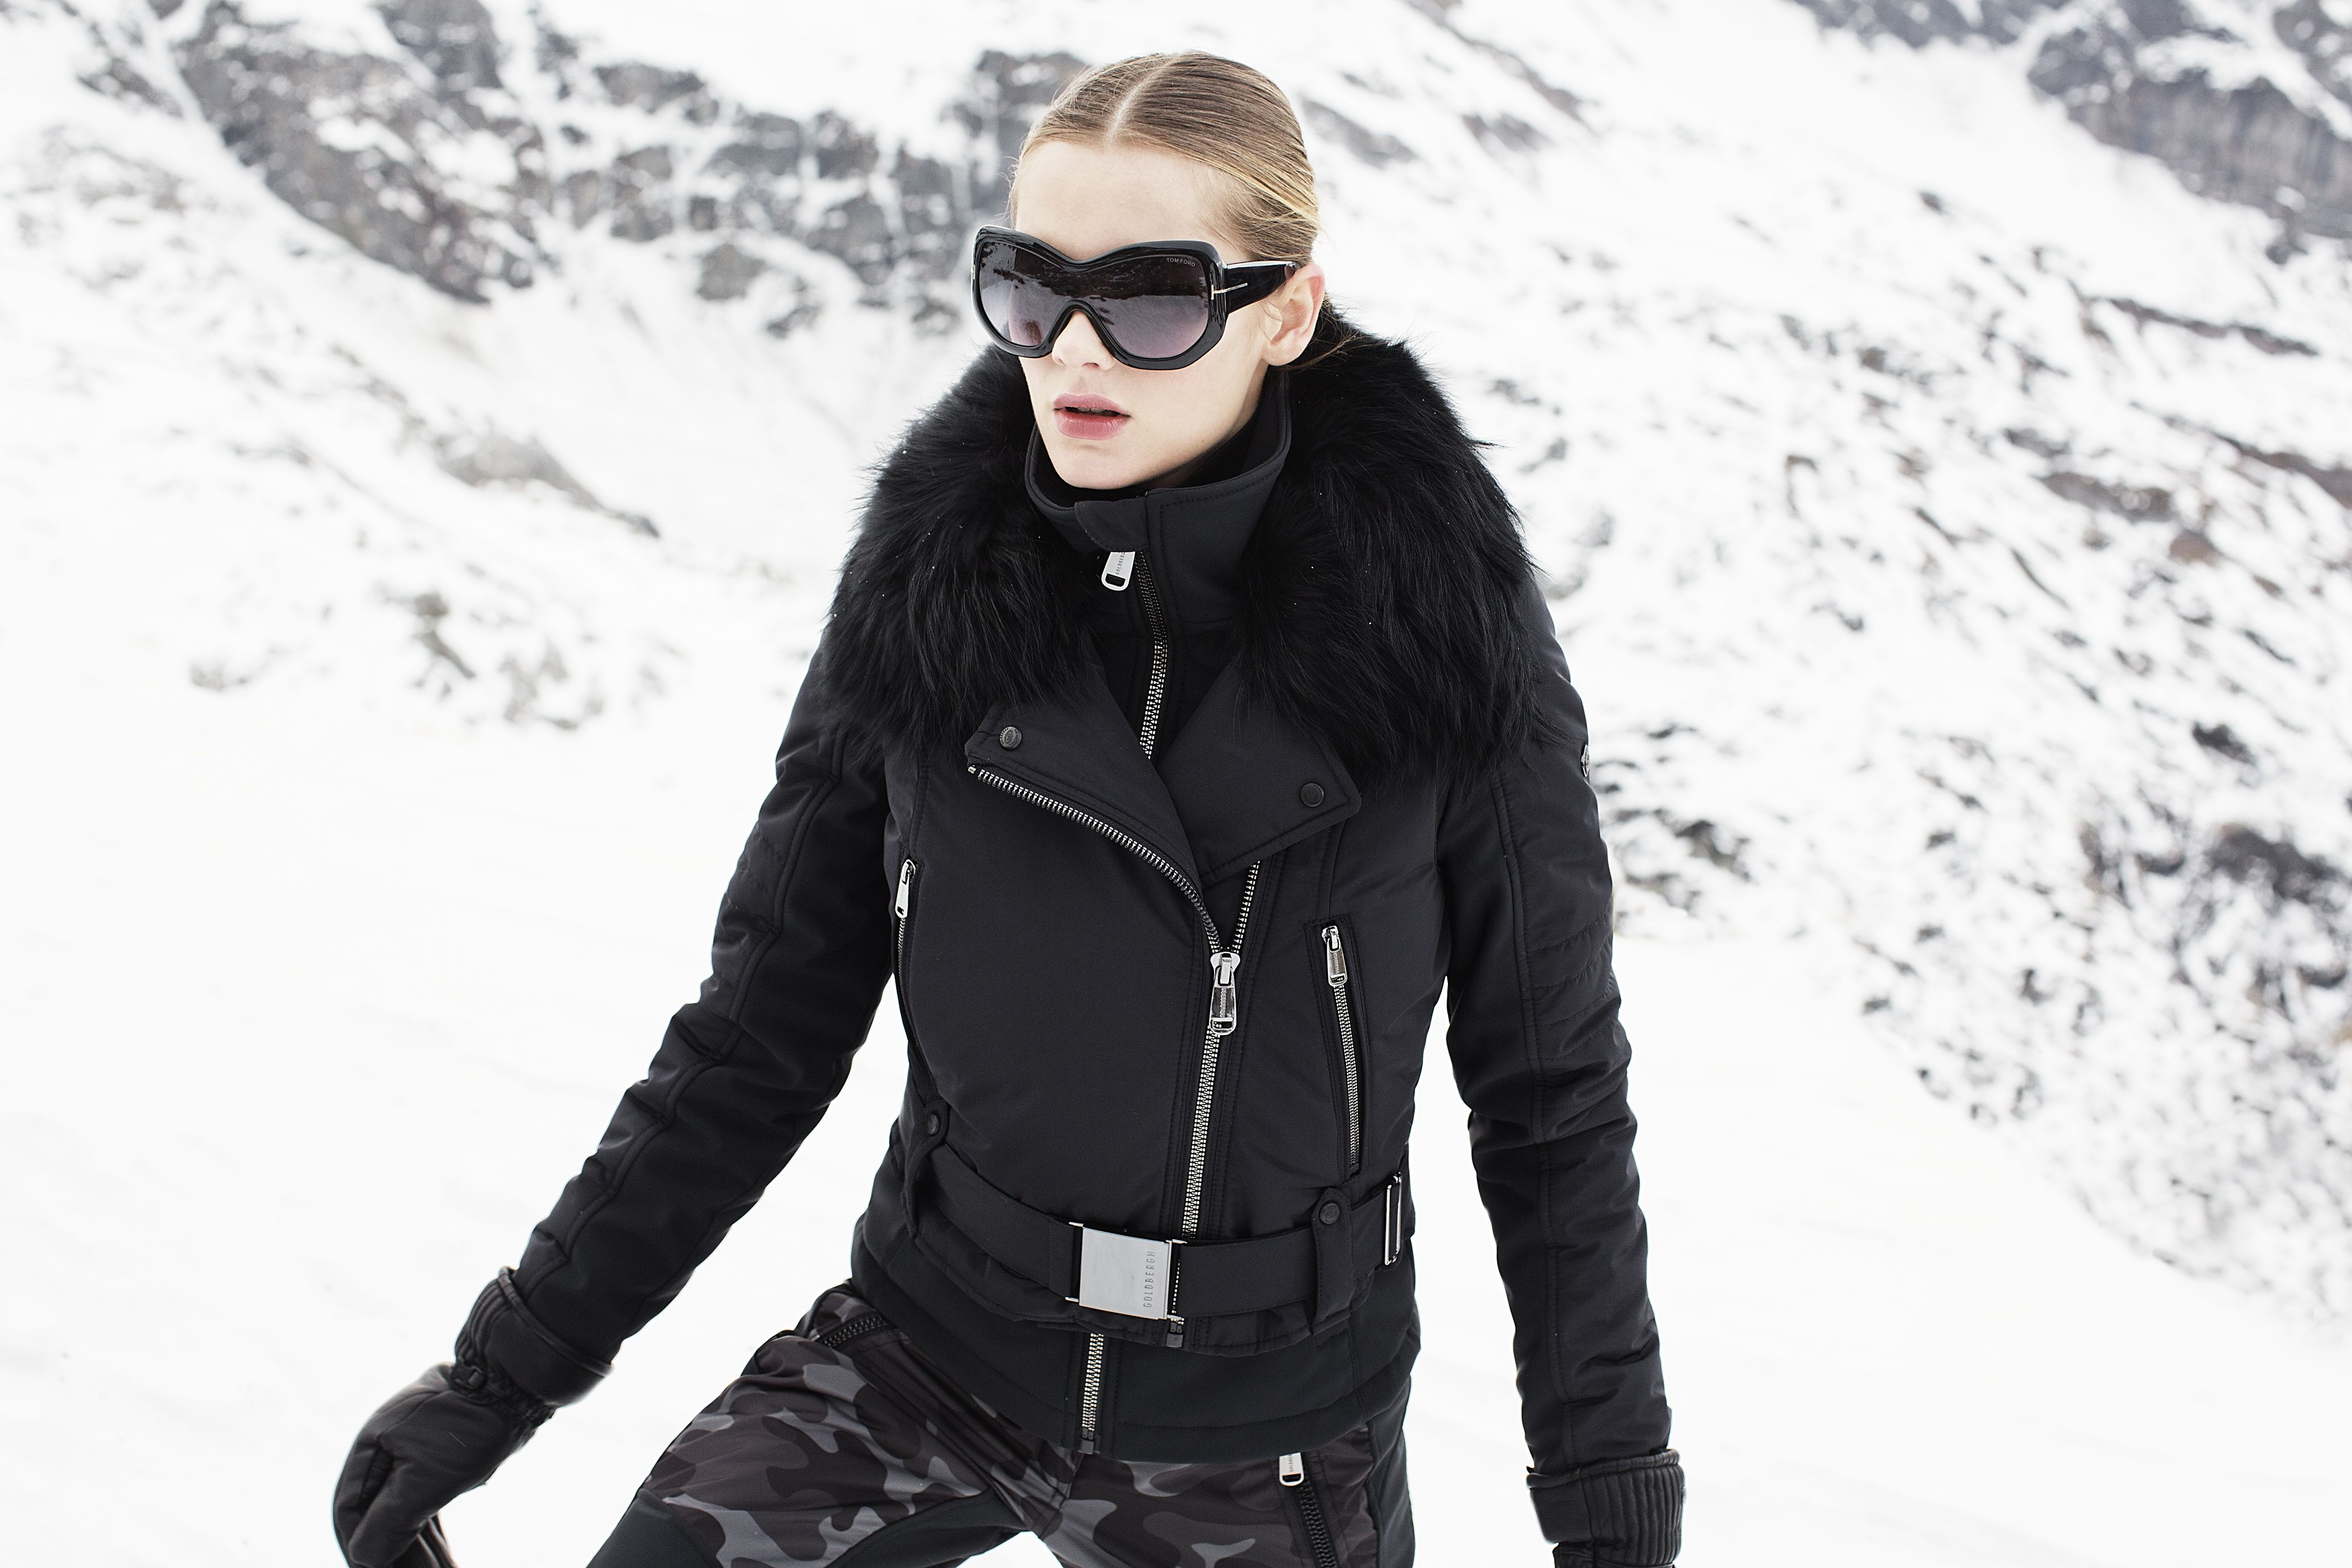 20fb4d5093 Miyoko GOLDBERGH Ski jacket and Kuru camouflage skipant. 2017 2018 Prada  sunglasses